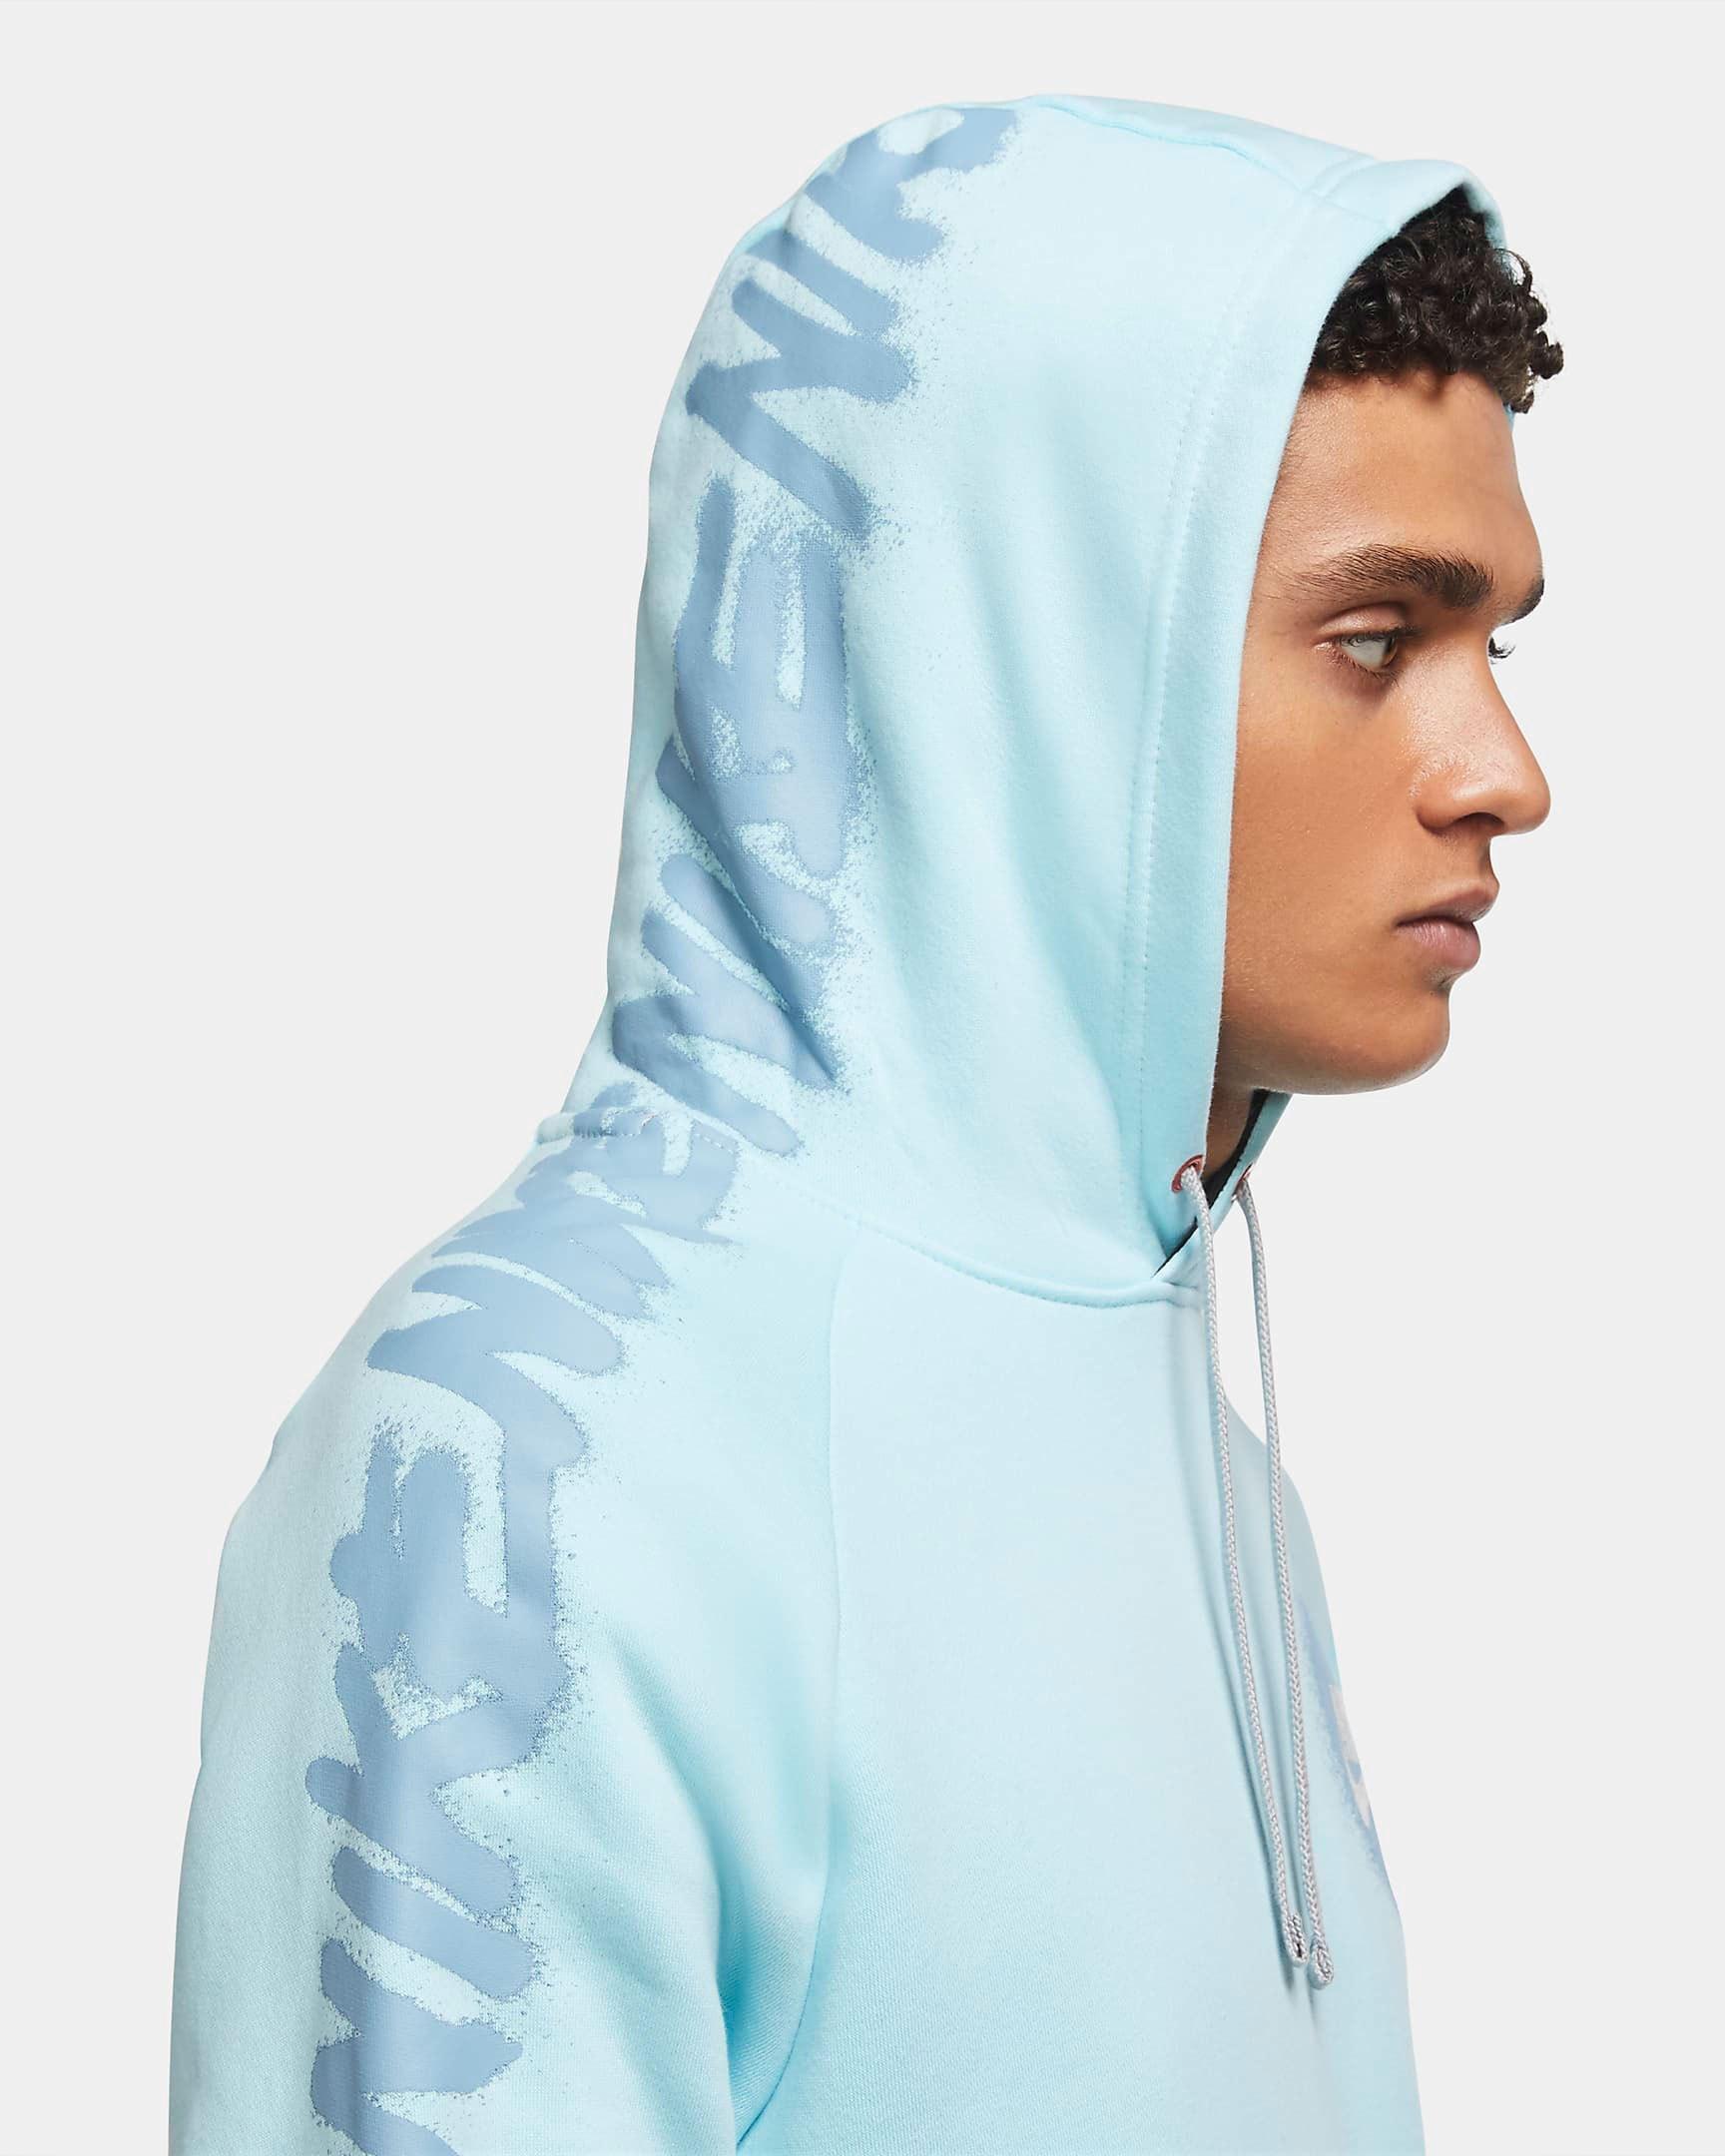 nike-sportswear-spray-paint-club-hoodie-blue-2